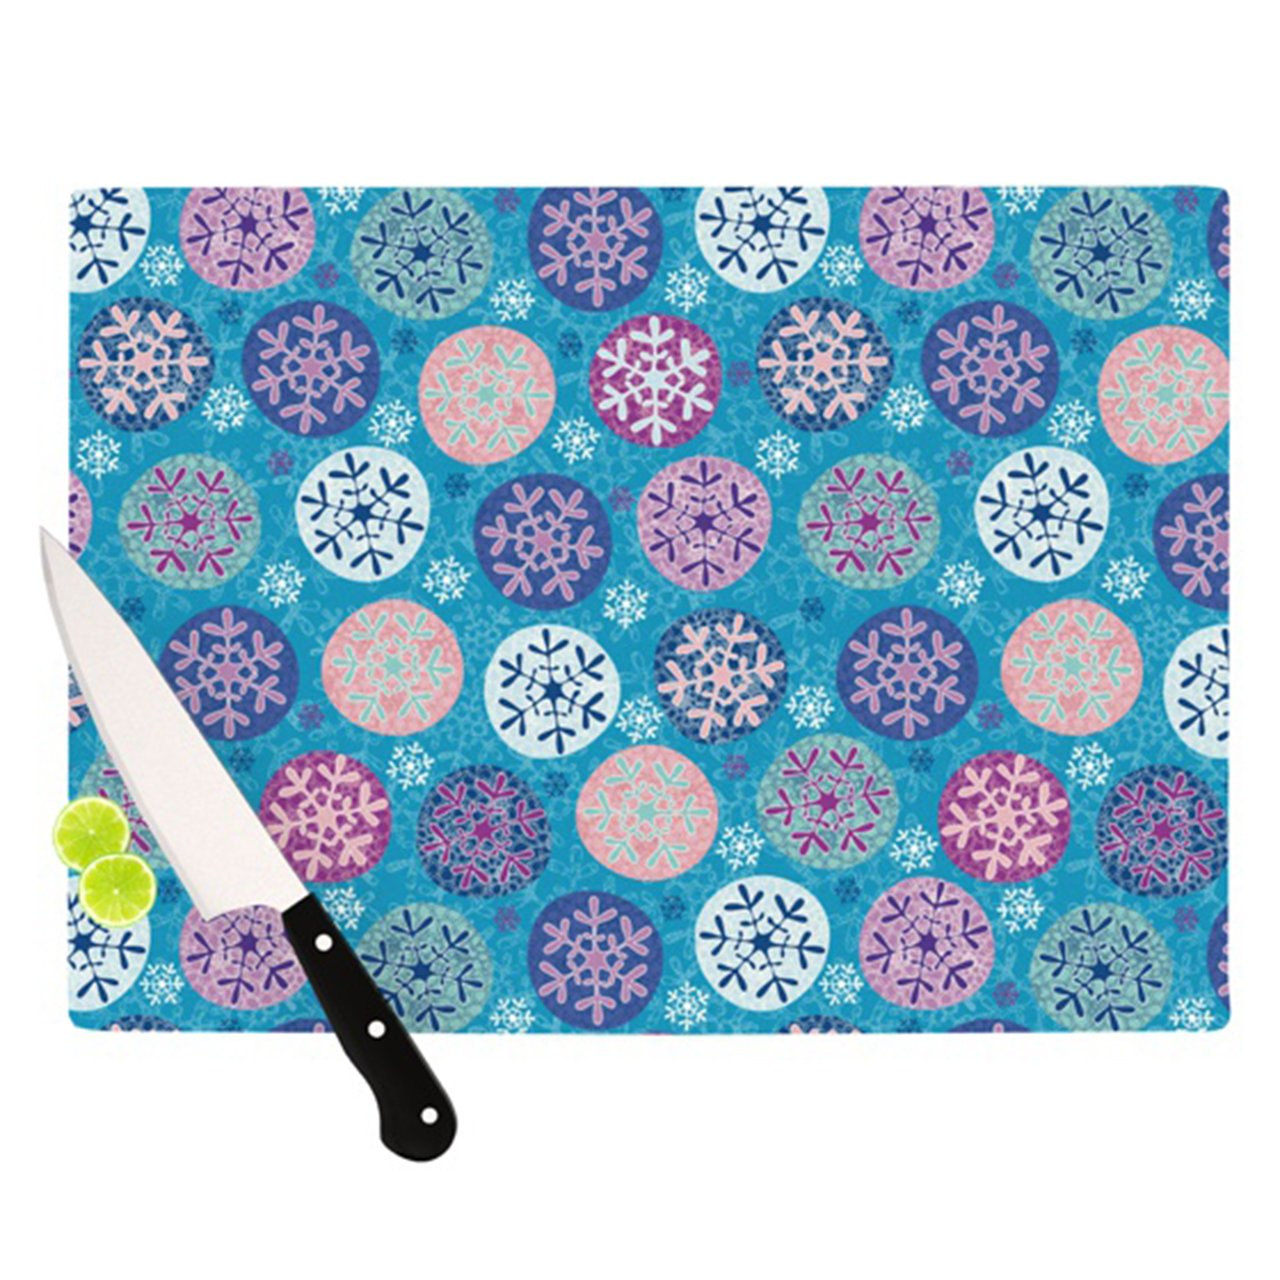 Kess InHouse Julia Grifol Floral Winter Cutting Board, 11.5 by 15.75-Inch